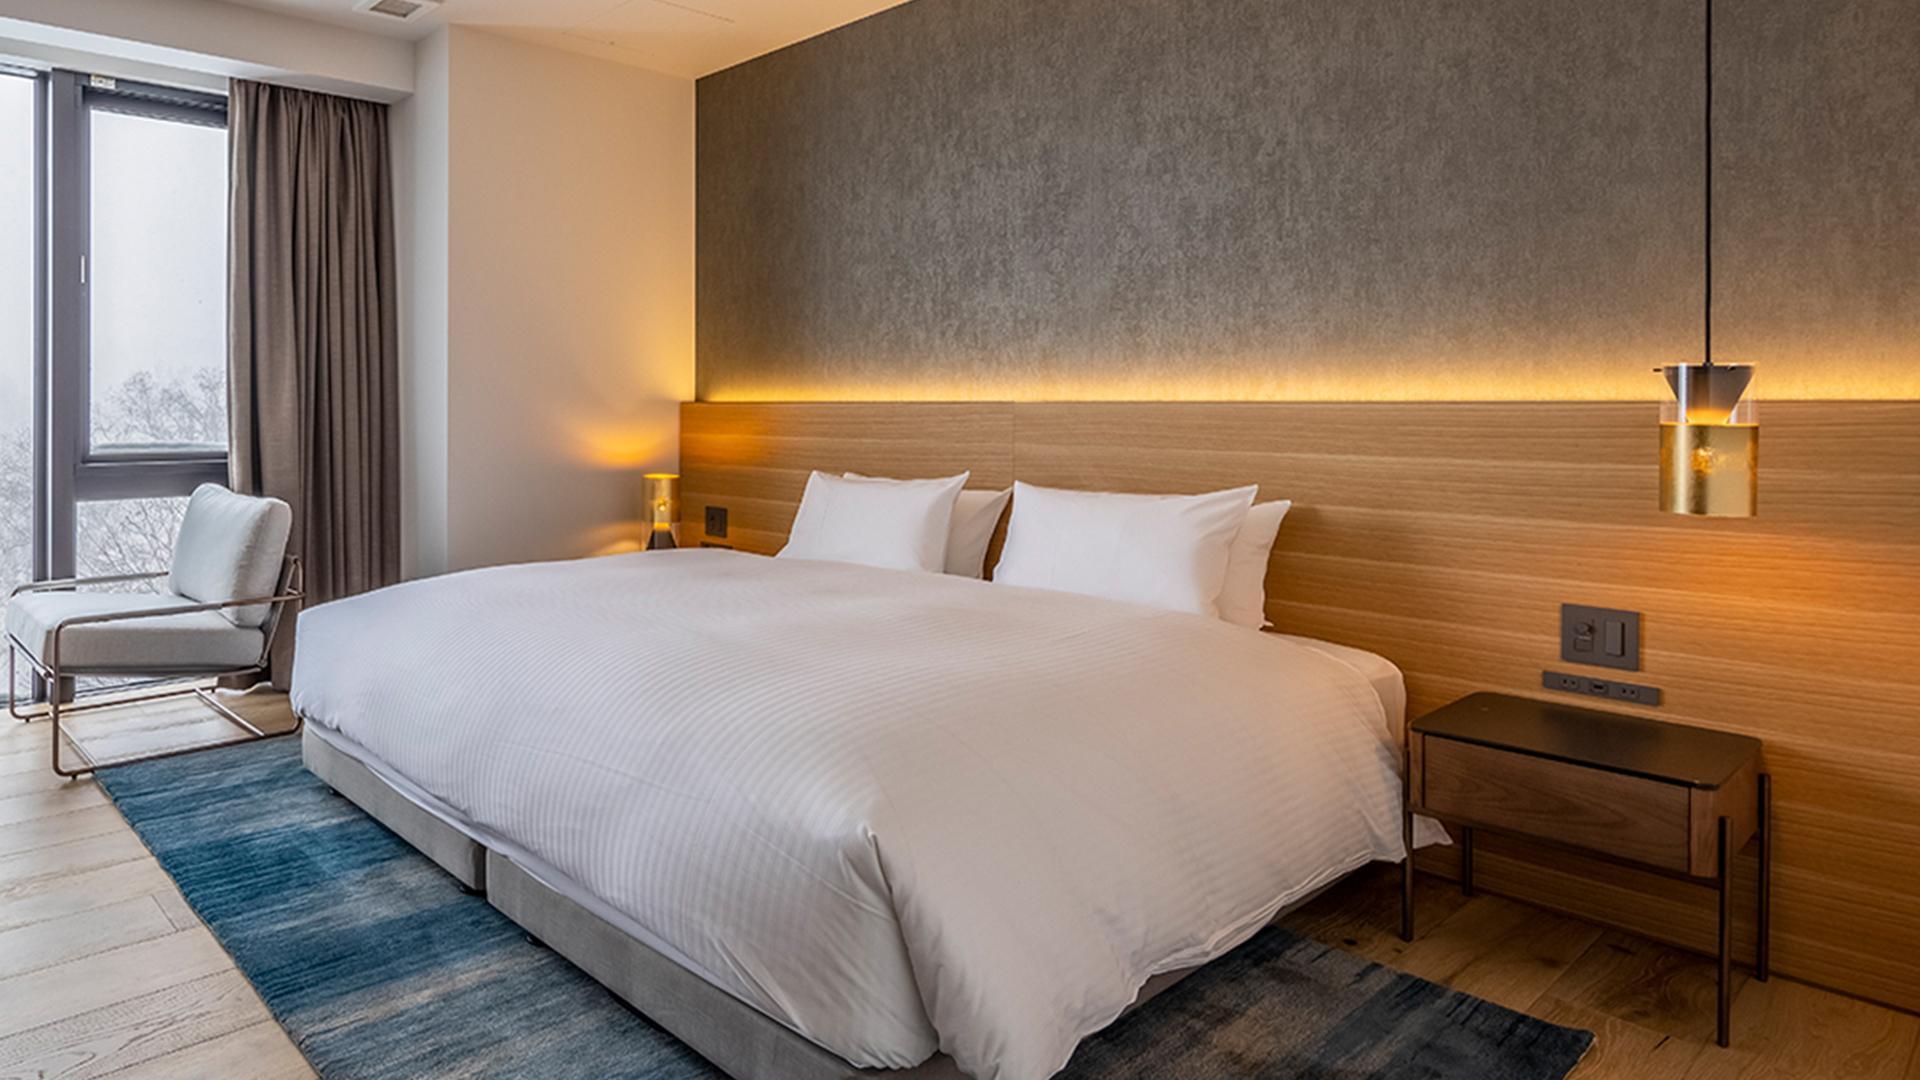 Two-Bedroom Premier Apartment image 1 at Intuition Niseko by Abuta District, Hokkaido, Japan